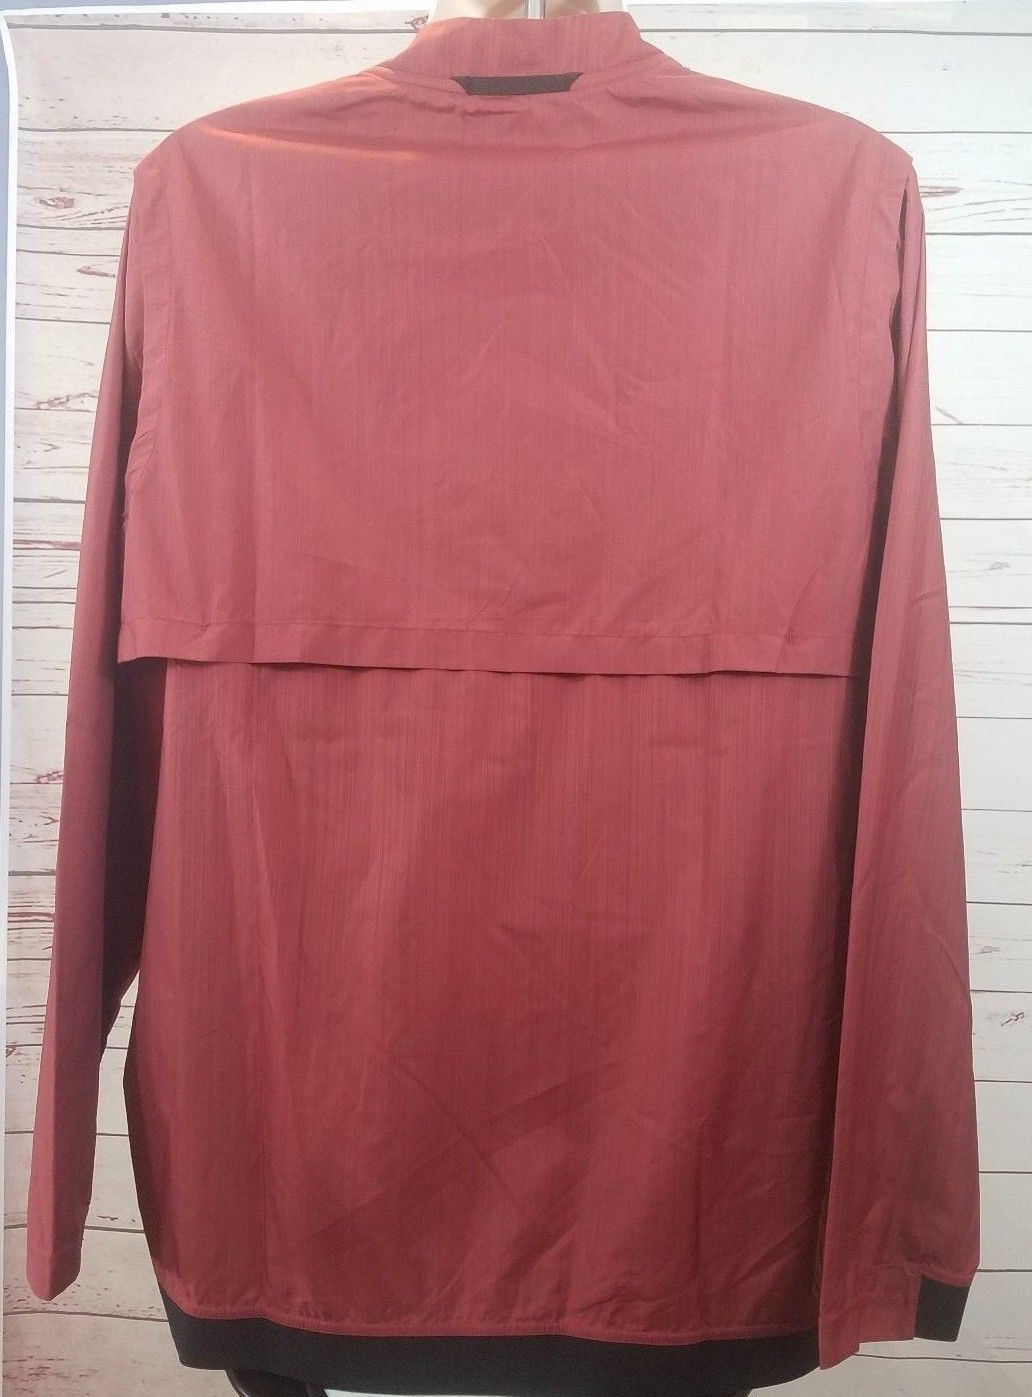 Nike Alabama Crimson Tide Lockdown Jacket Men's Large Red 1/4 Zip $75 908417